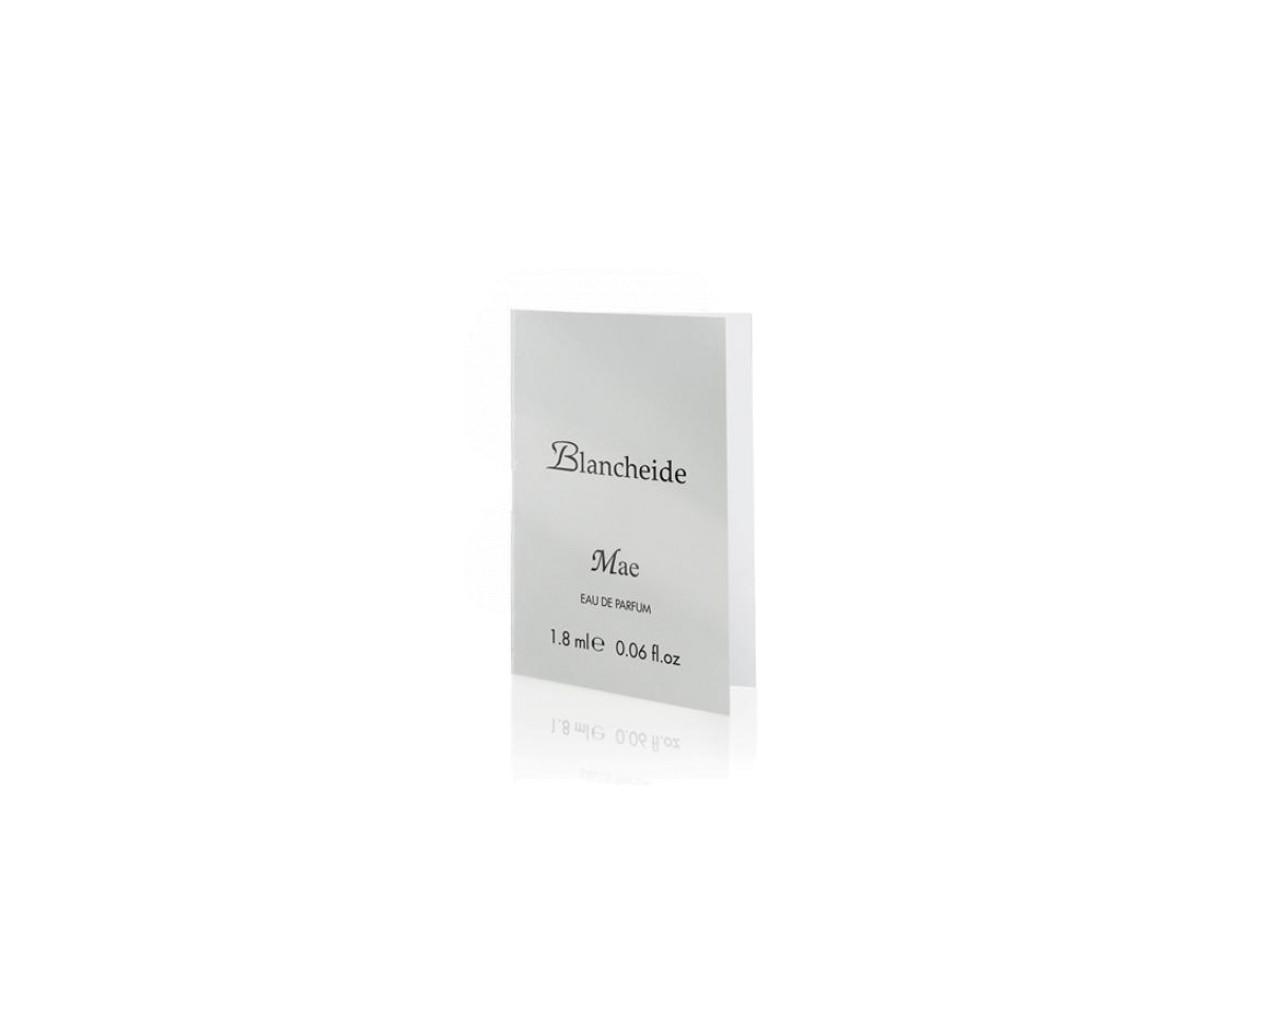 Campioncino Mae Blancheide EDP 1,8 ml Blancheide BLAS001MA-02